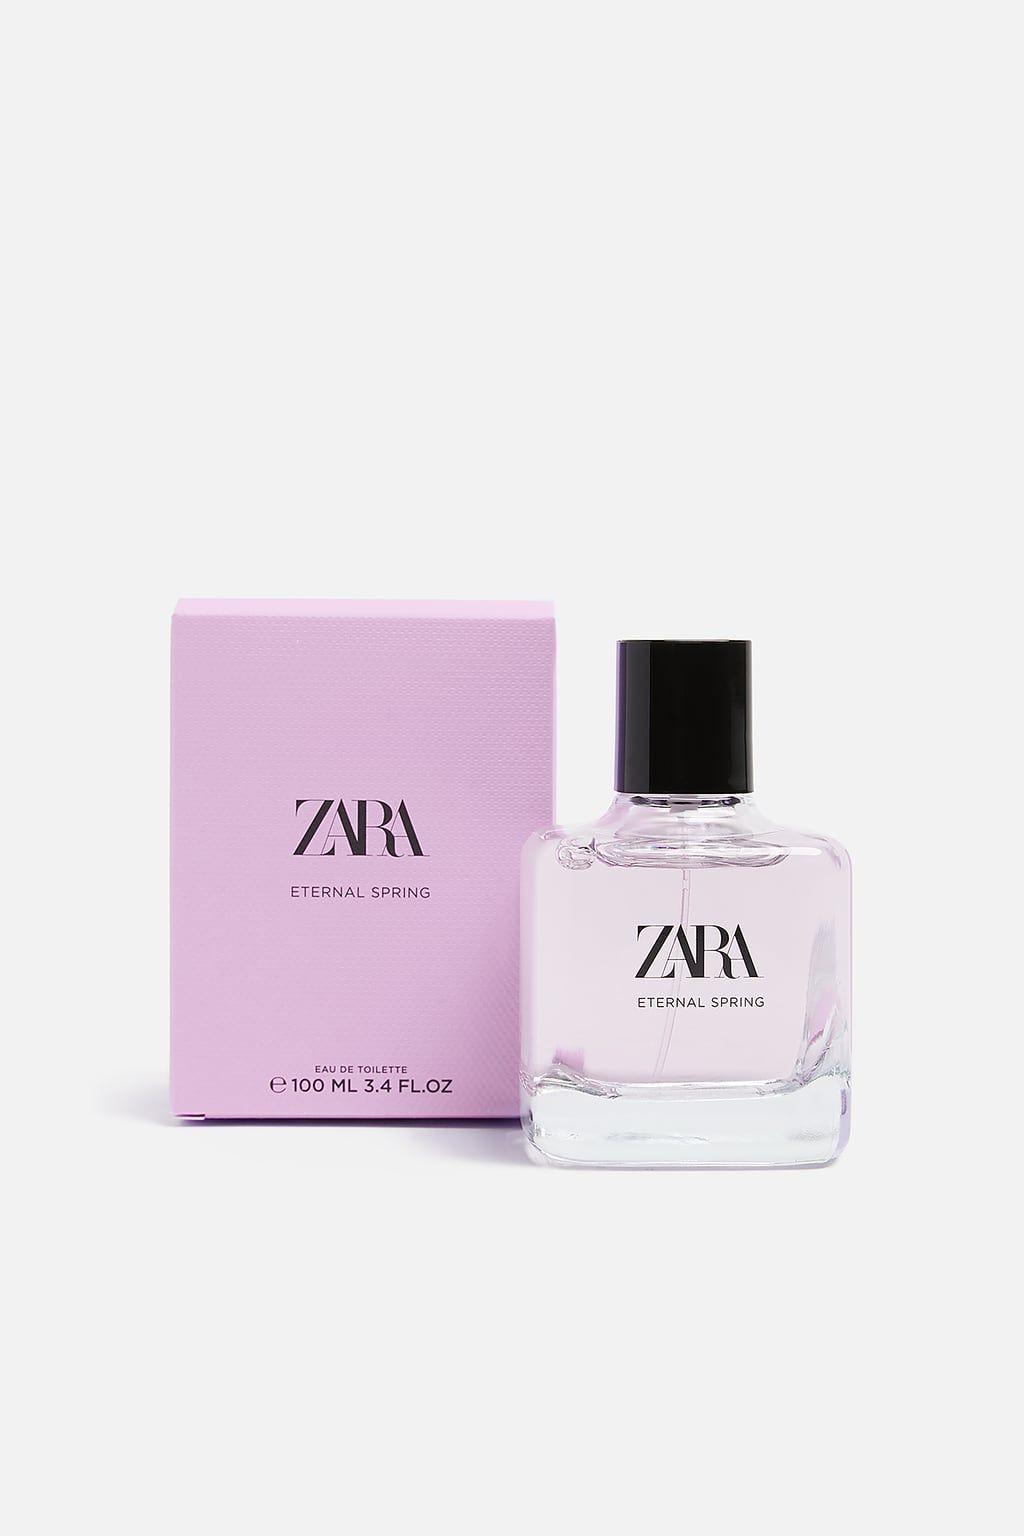 Eternal spring 100ml | Zara, Zara fragrance, Perfume reviews